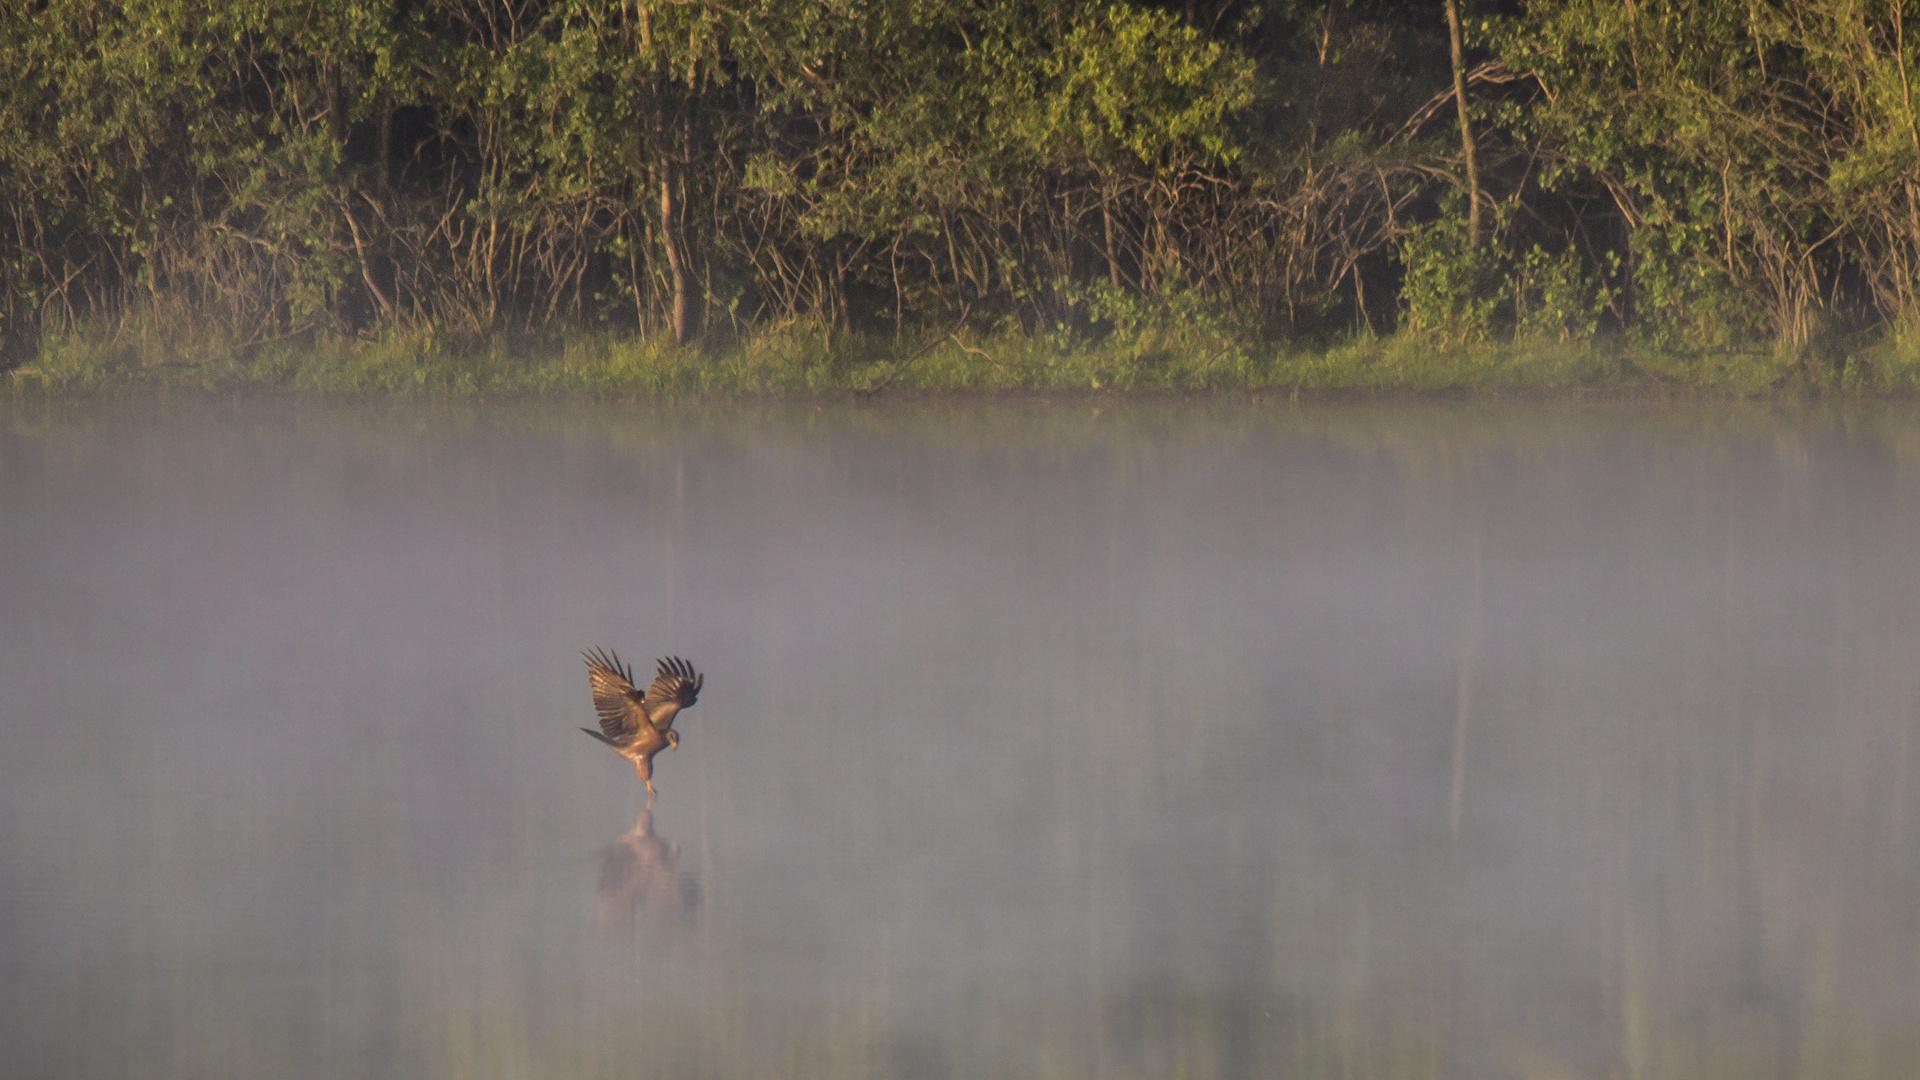 Jagd im Nebel